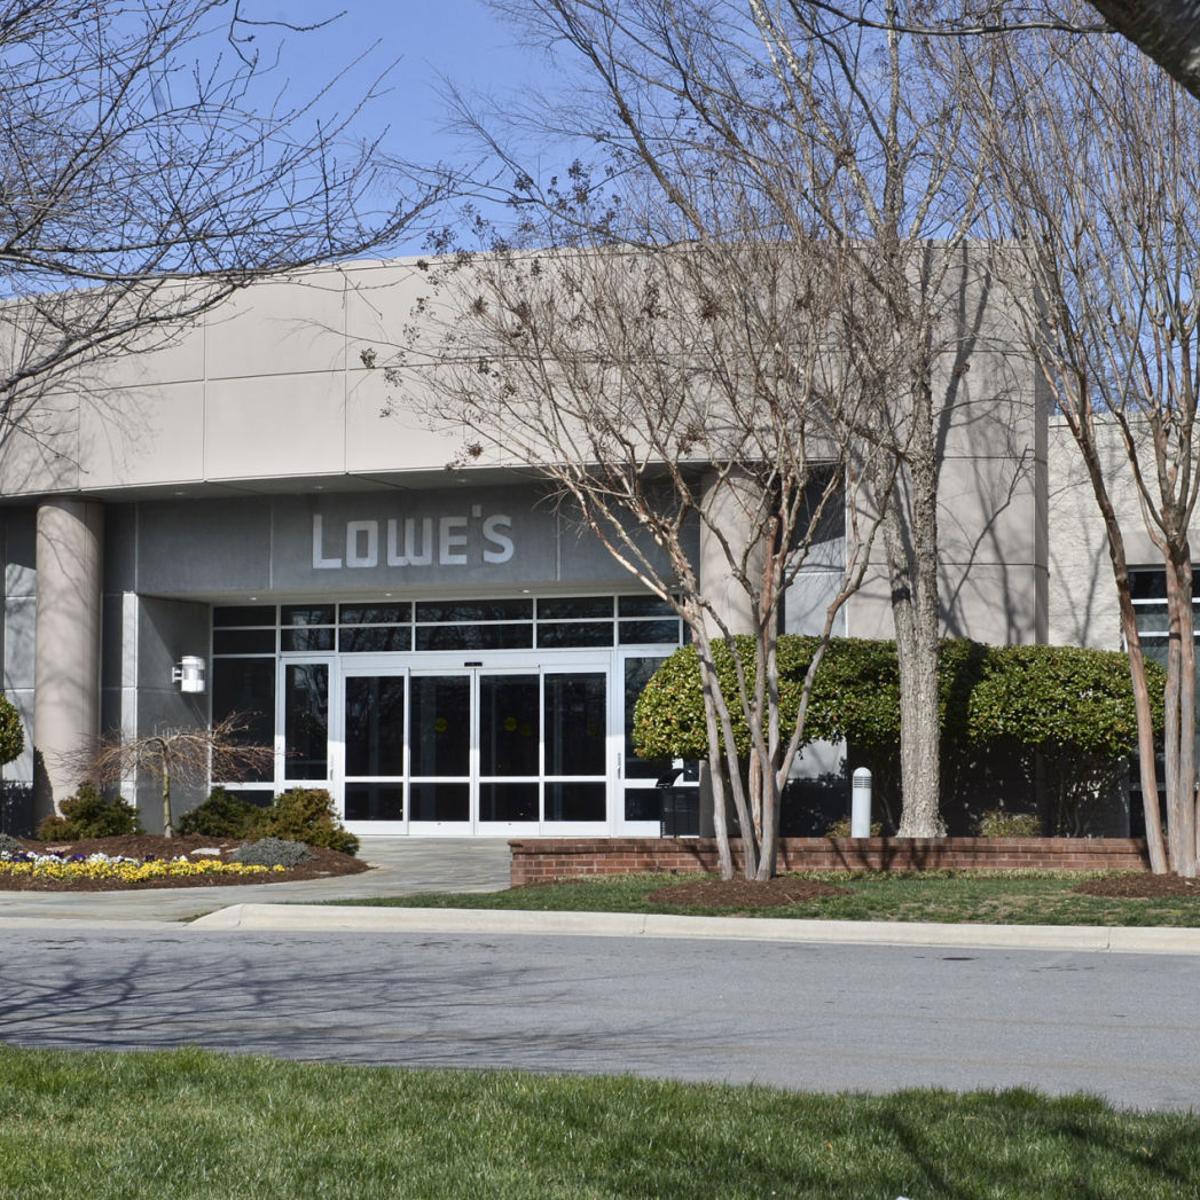 Lowe's plans 75 job cuts in Wilkesboro